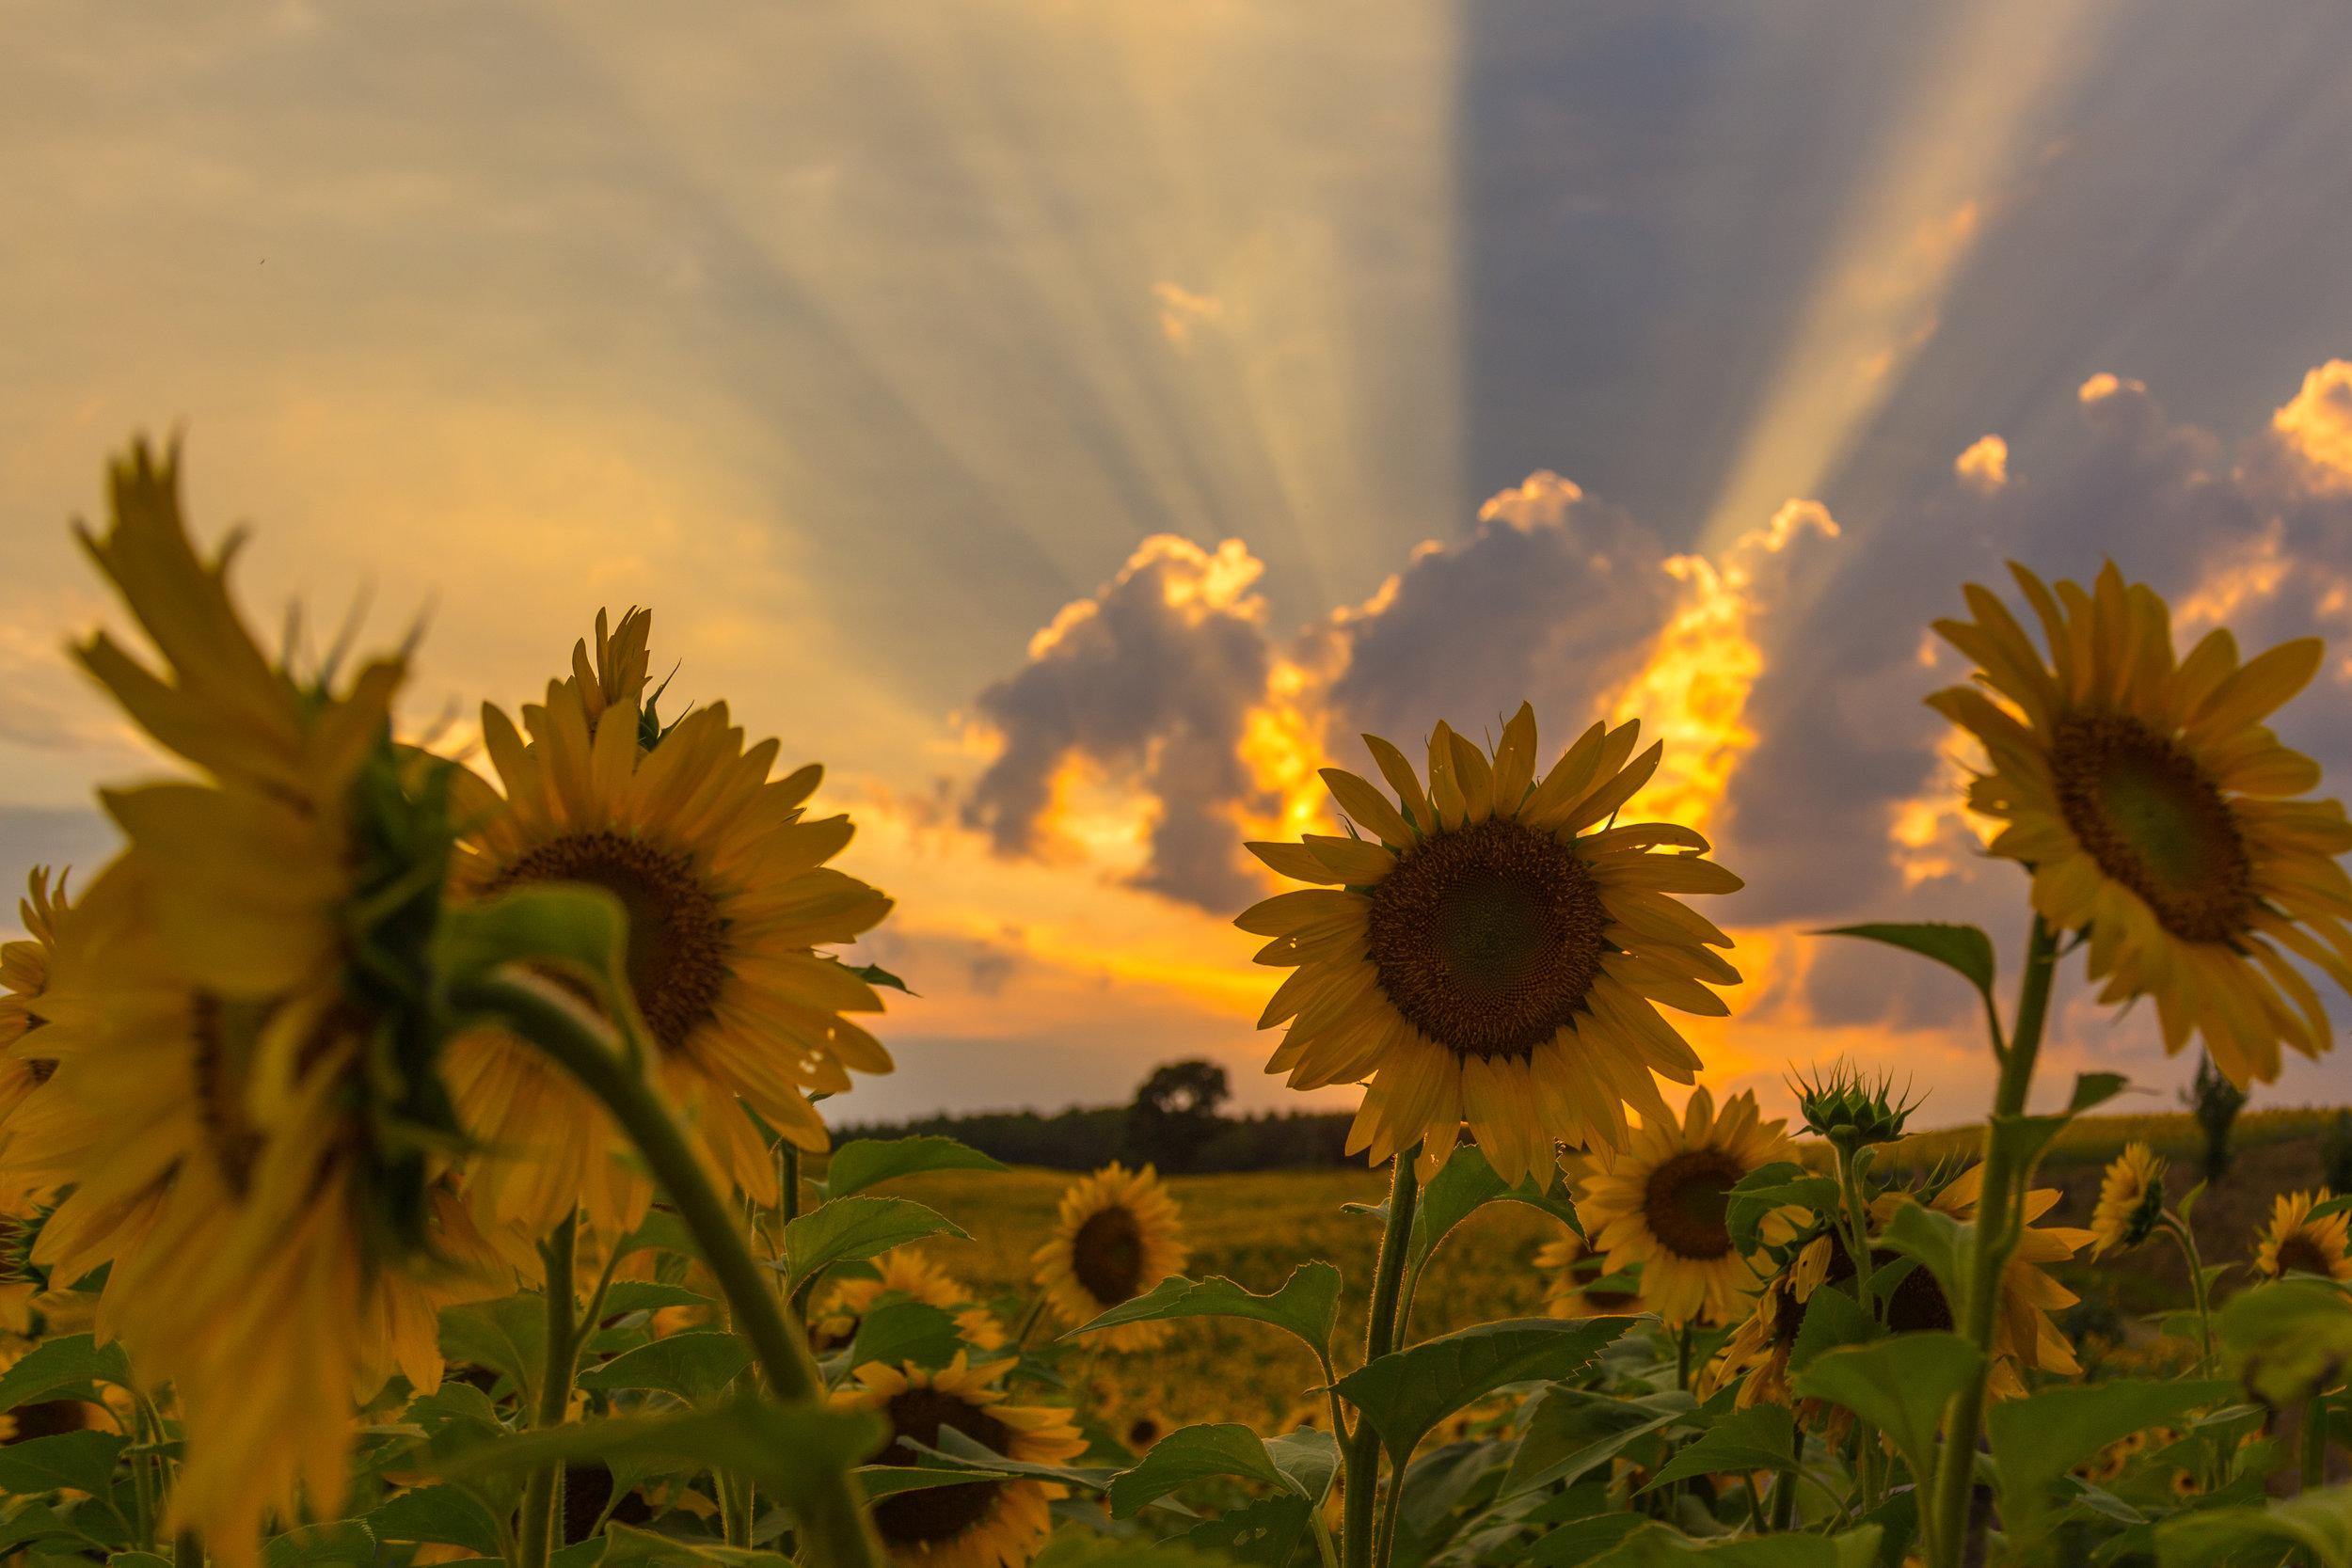 Sunset_Sunflower.jpg